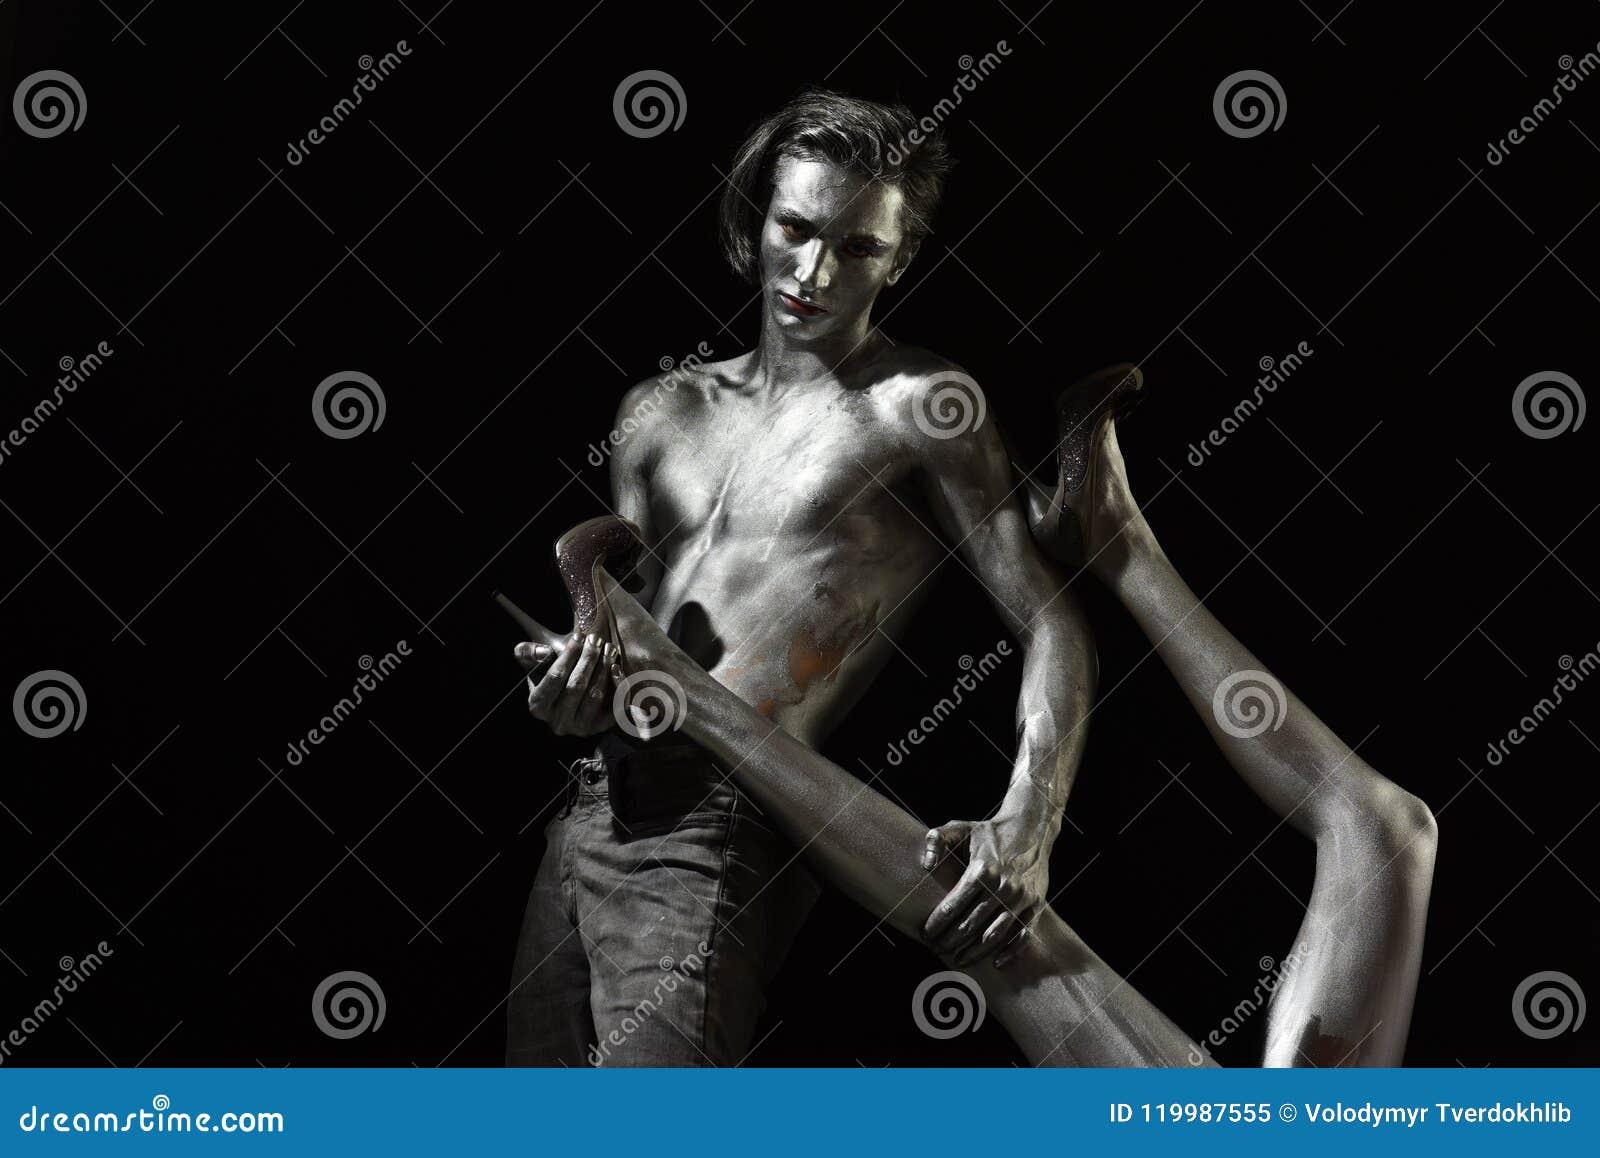 Black pussy pornhub